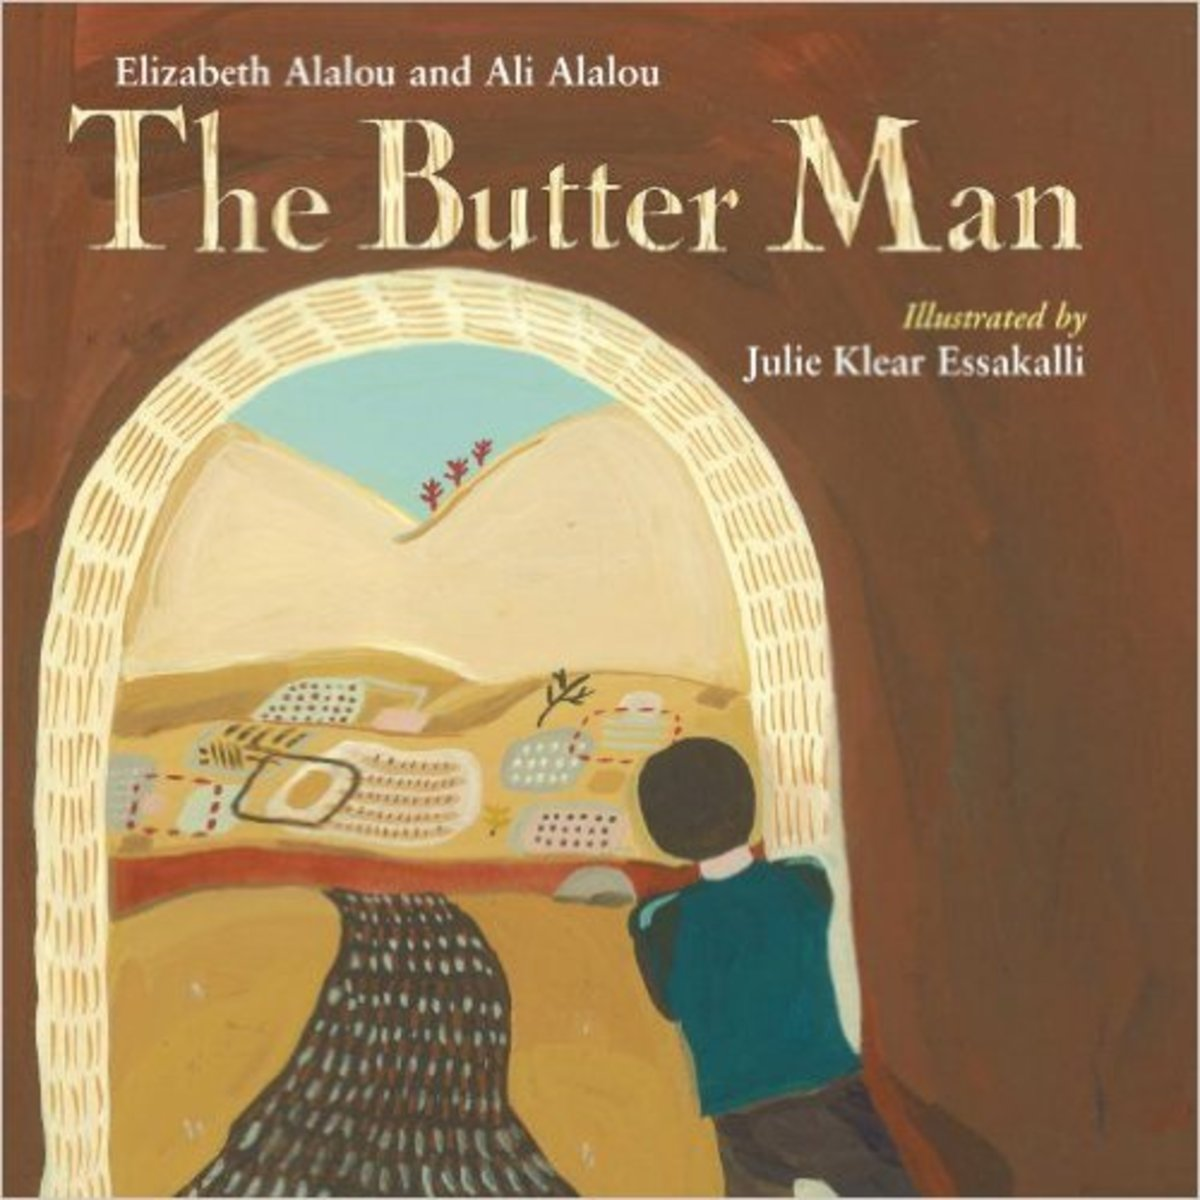 The Butter Man by Elizabeth Letts